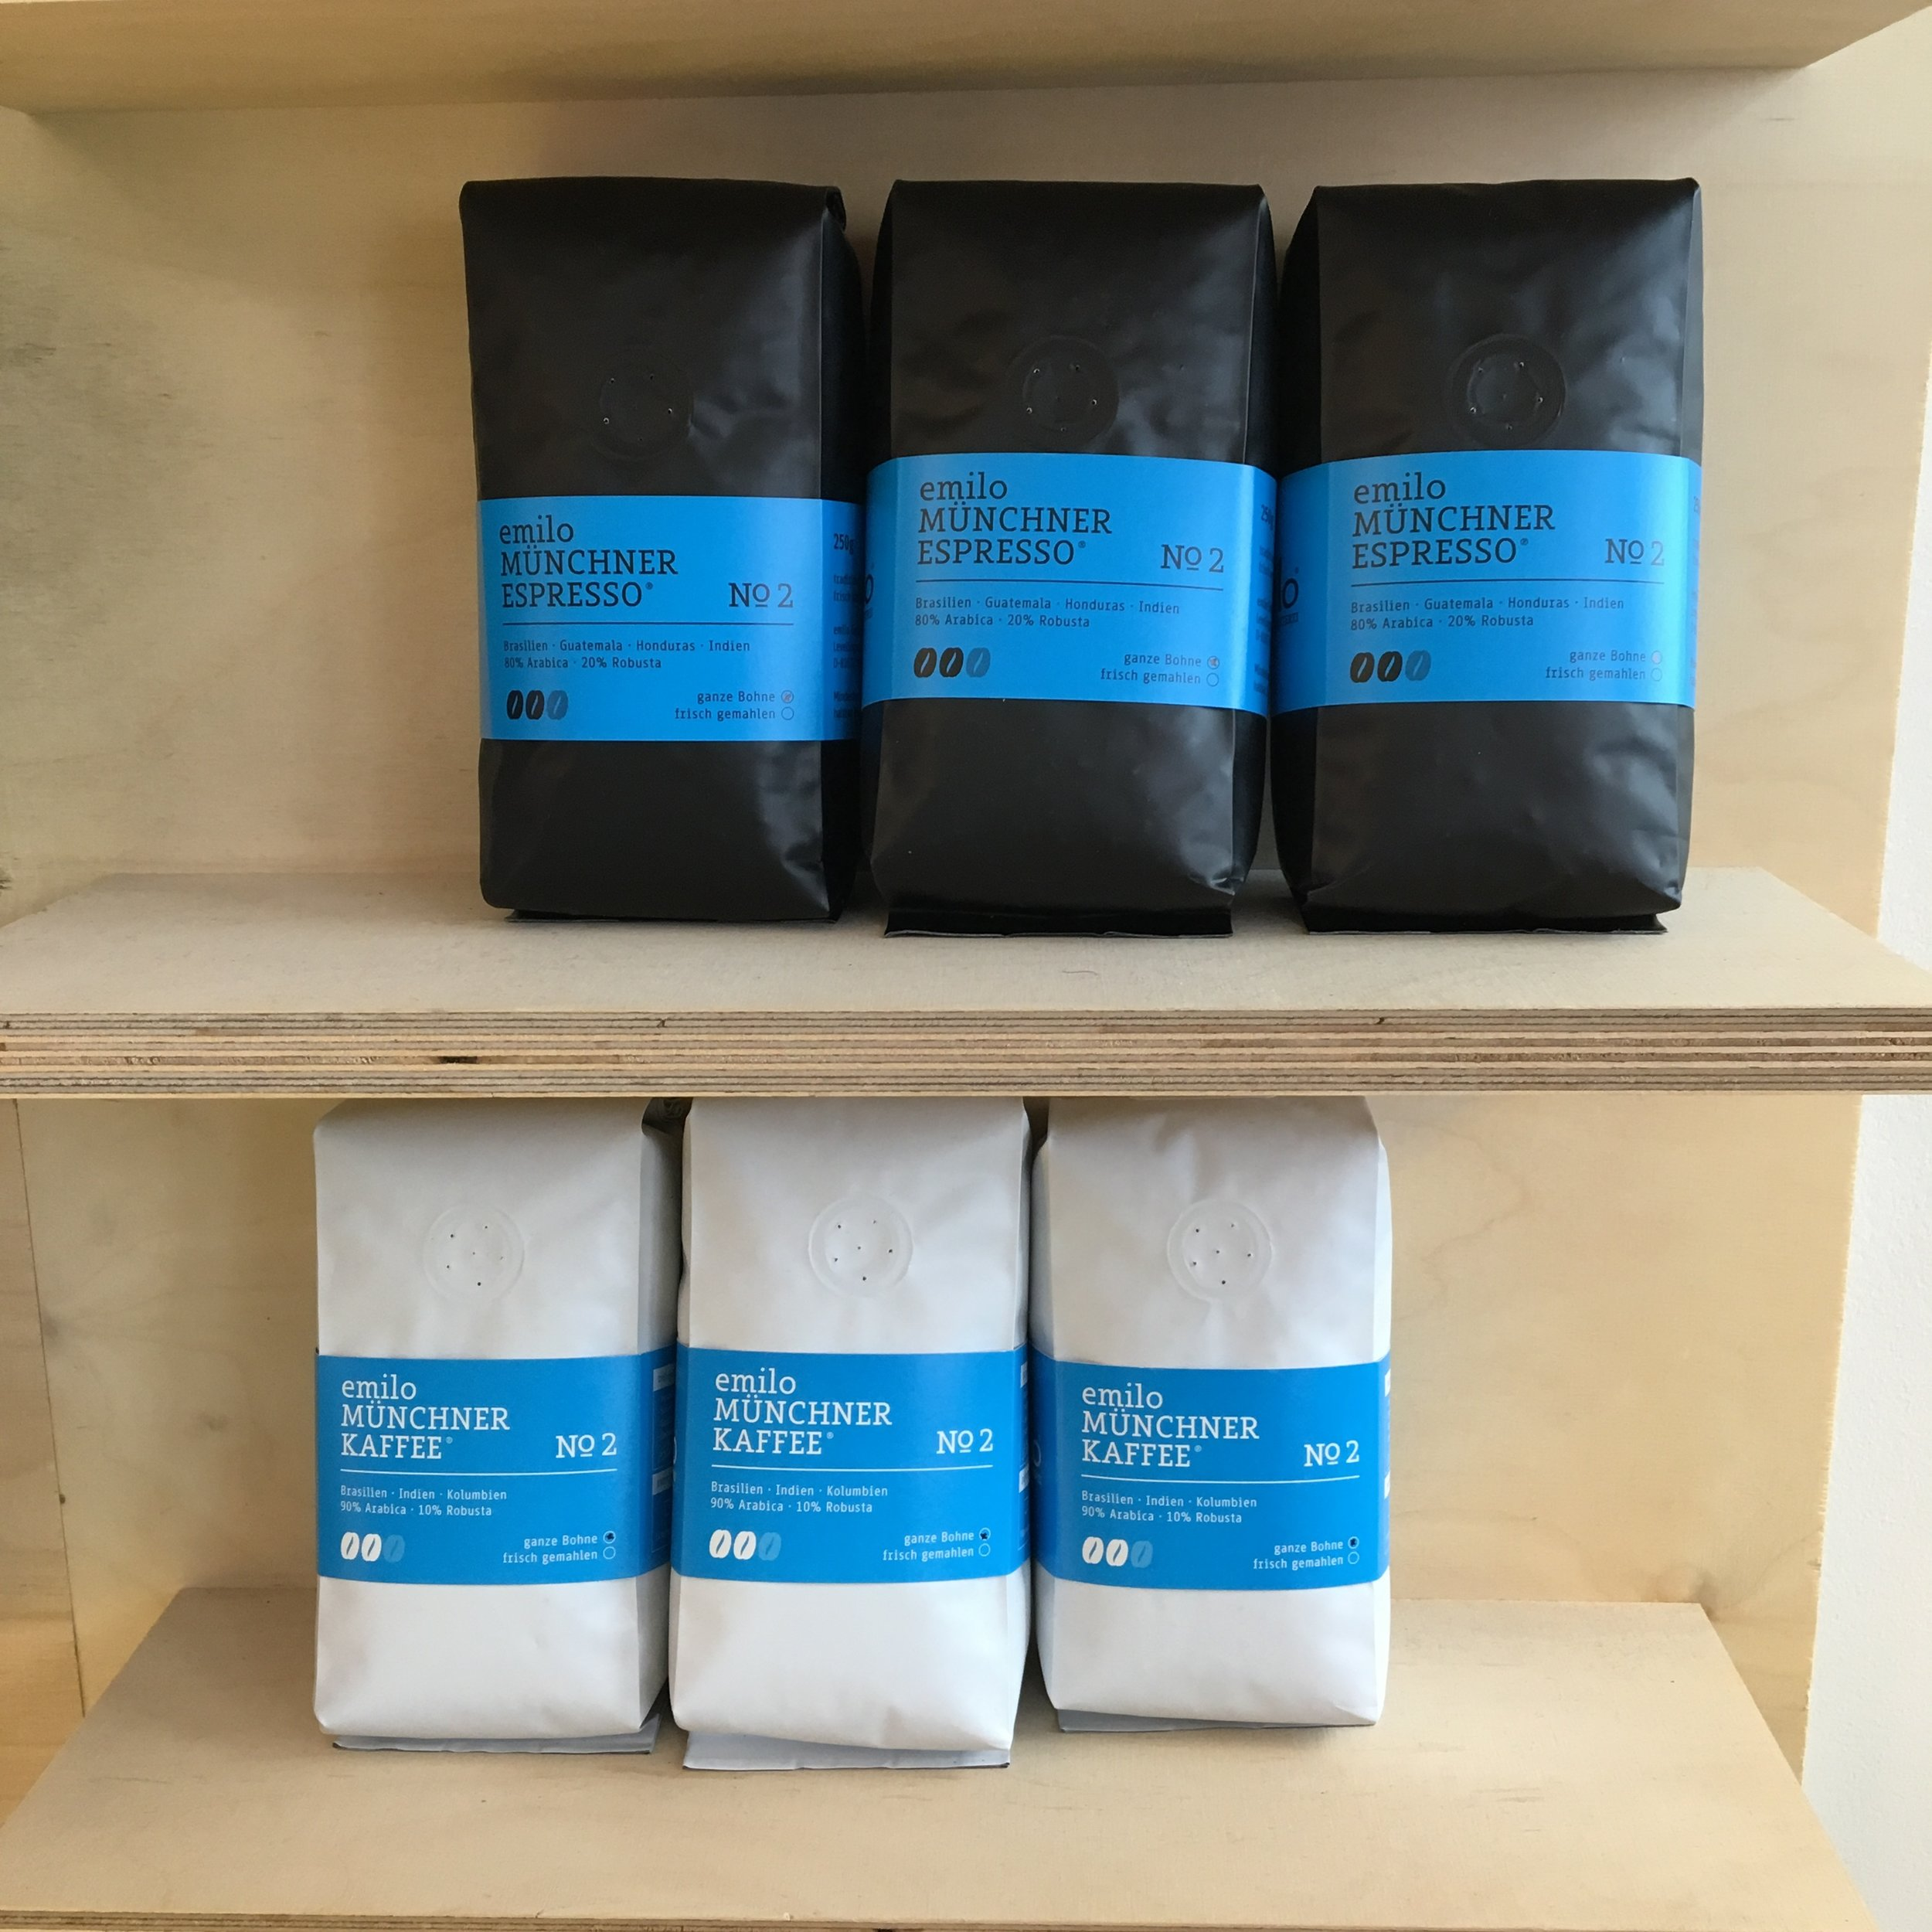 emilo coffee